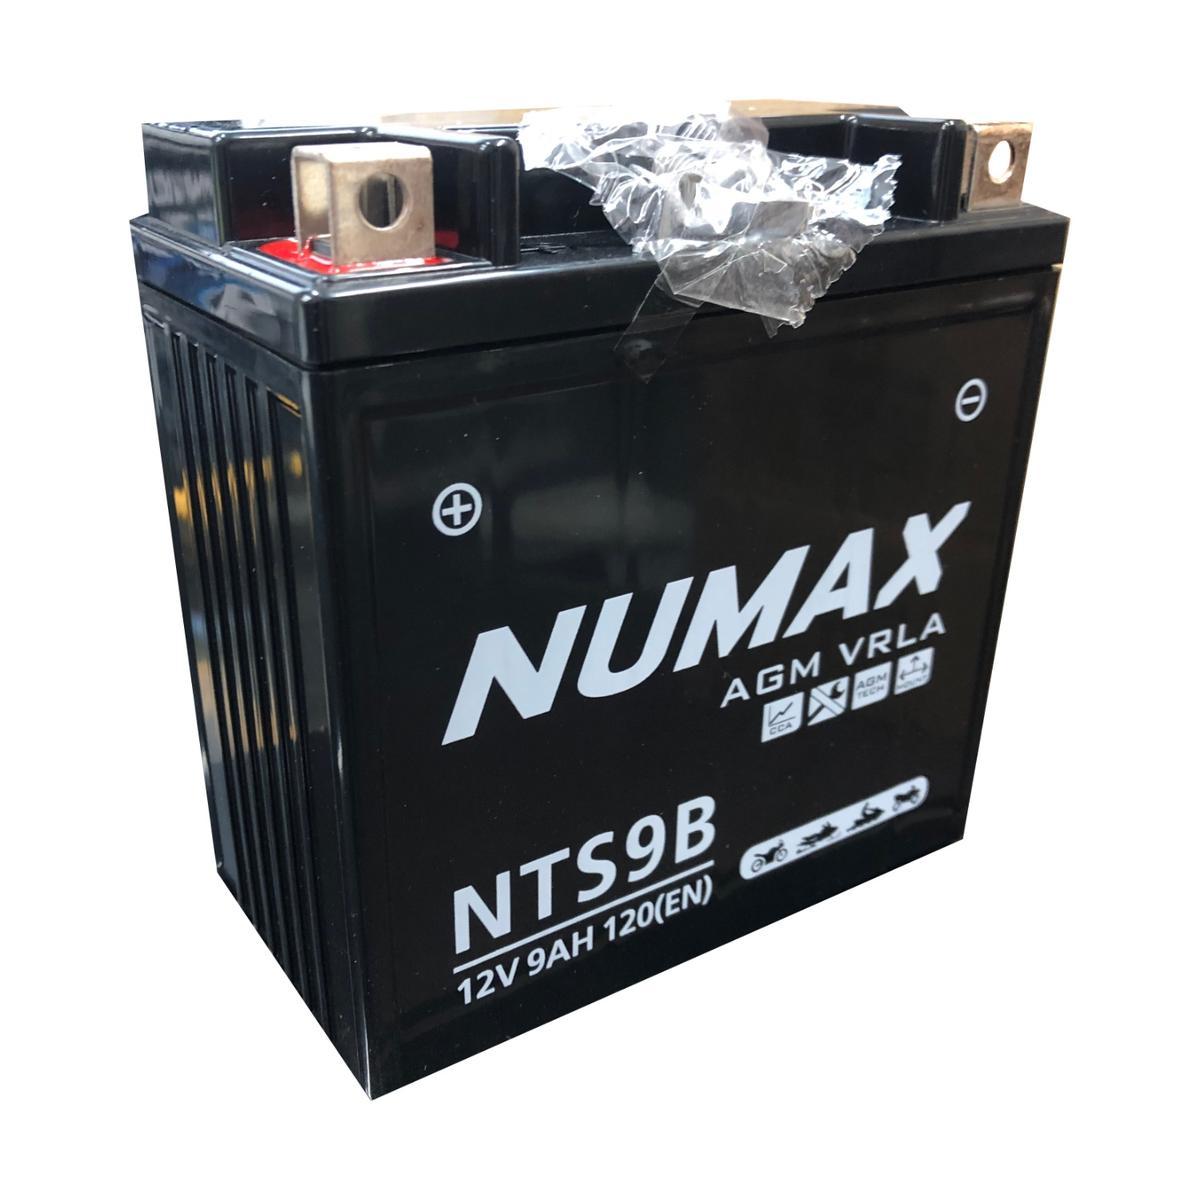 Numax NTS9B 12v Bike Motorbike Motorcycle Battery VESPA 200cc Cosa YB9L-B